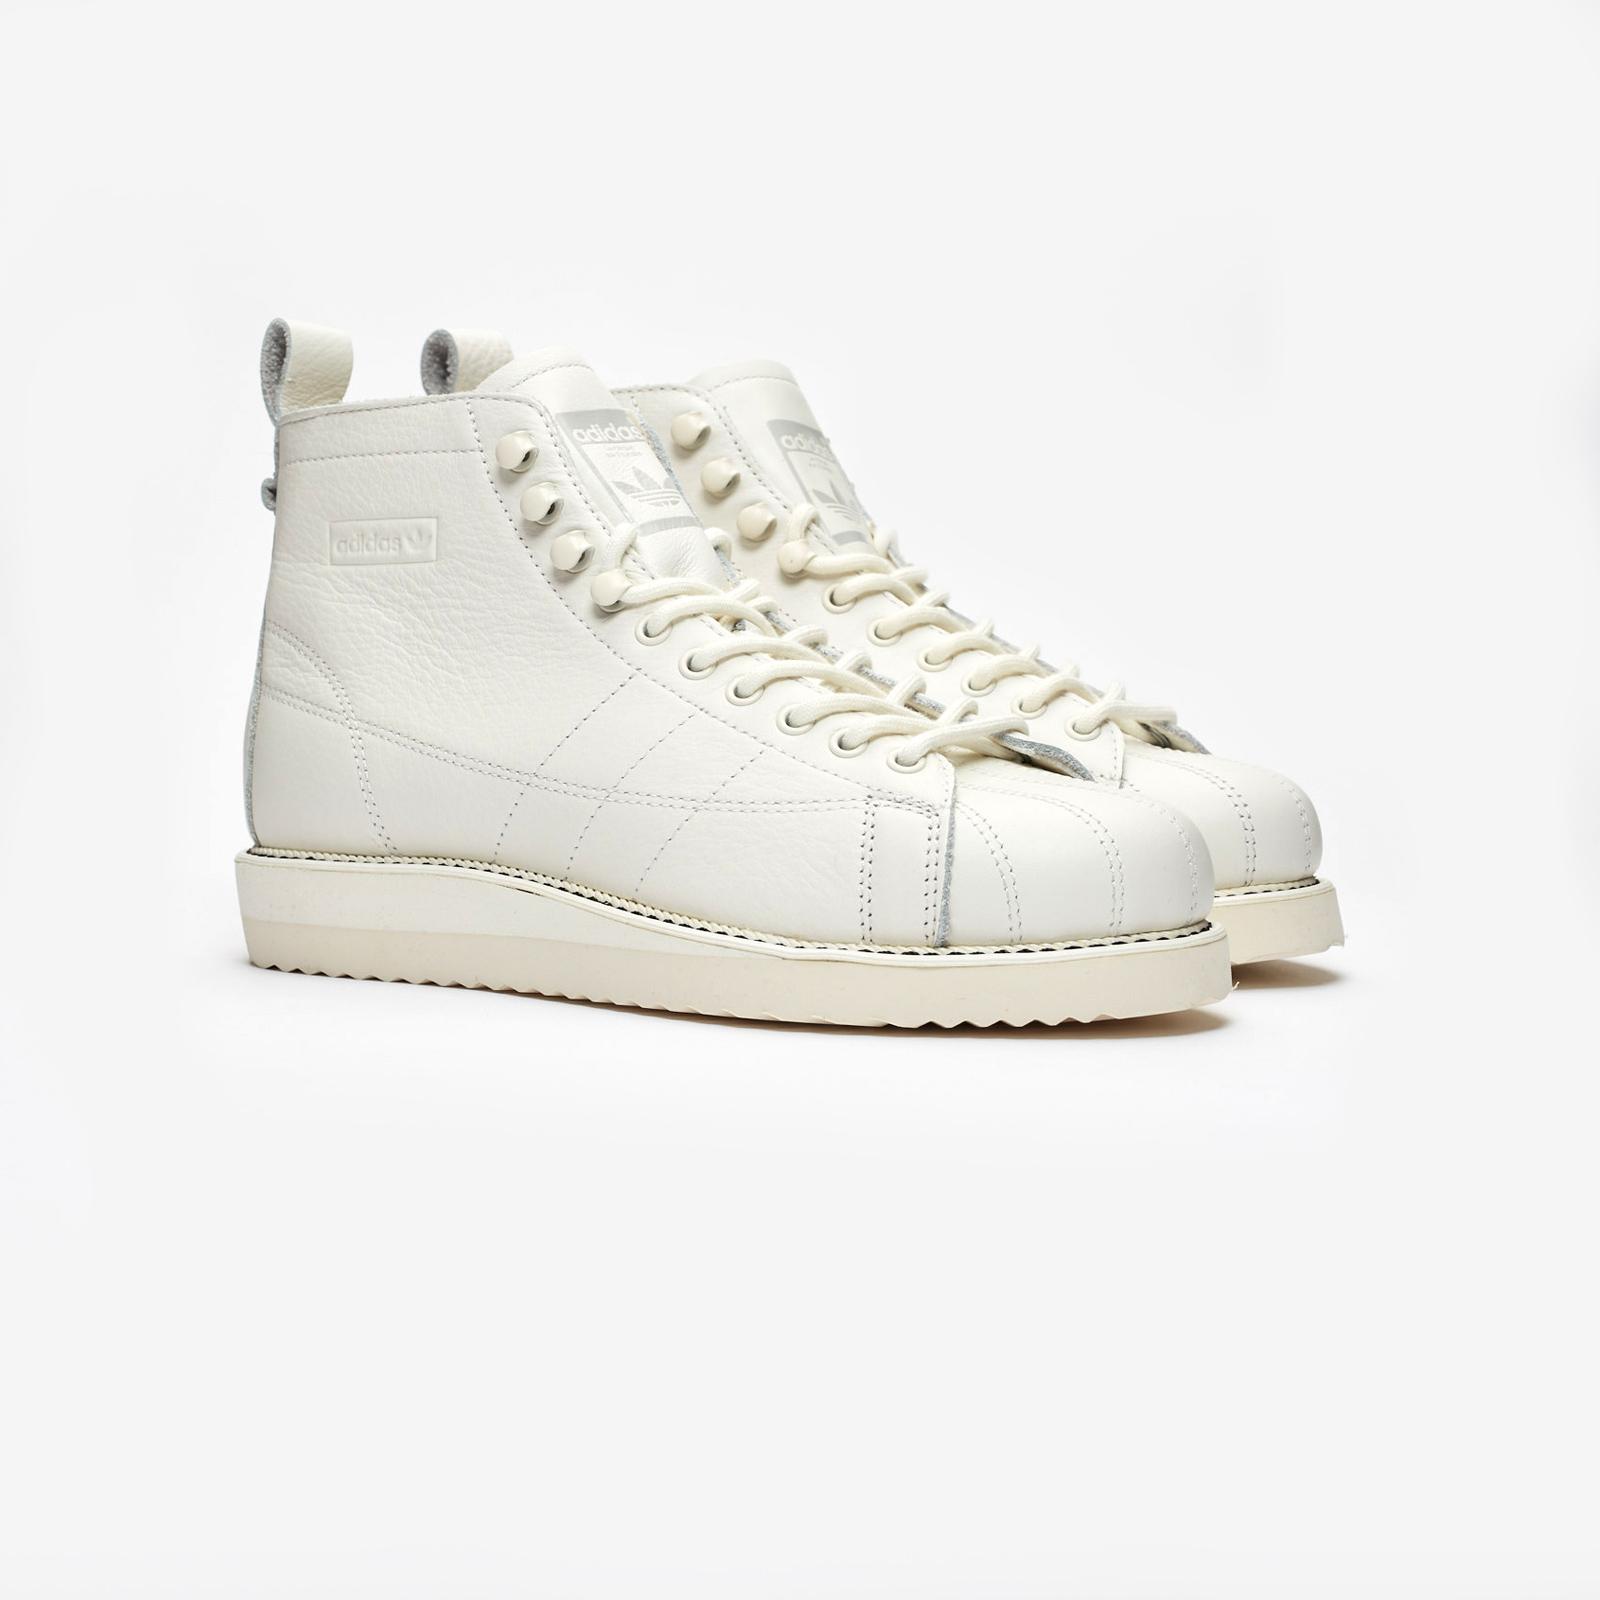 adidas Superstar Boot W - B28162 - SNS | sneakers & streetwear ...